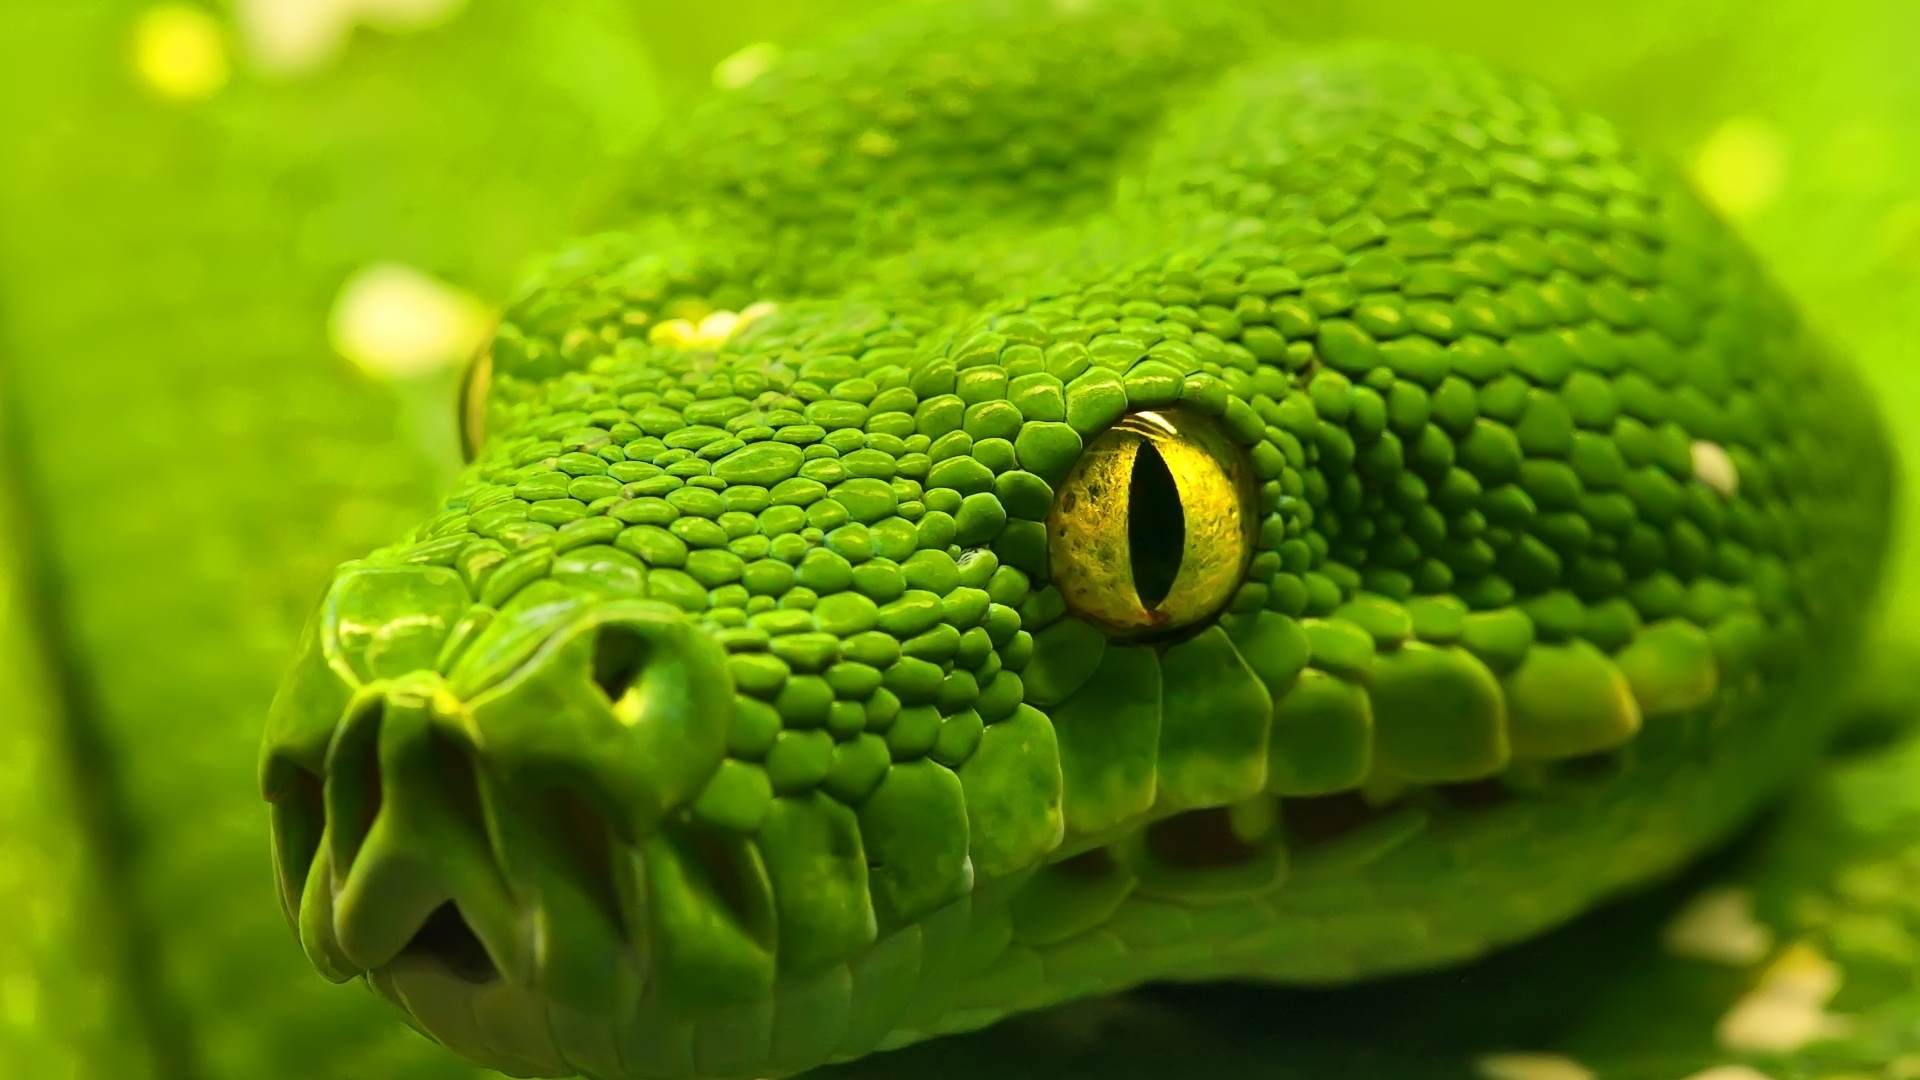 Mamba змея зеленая